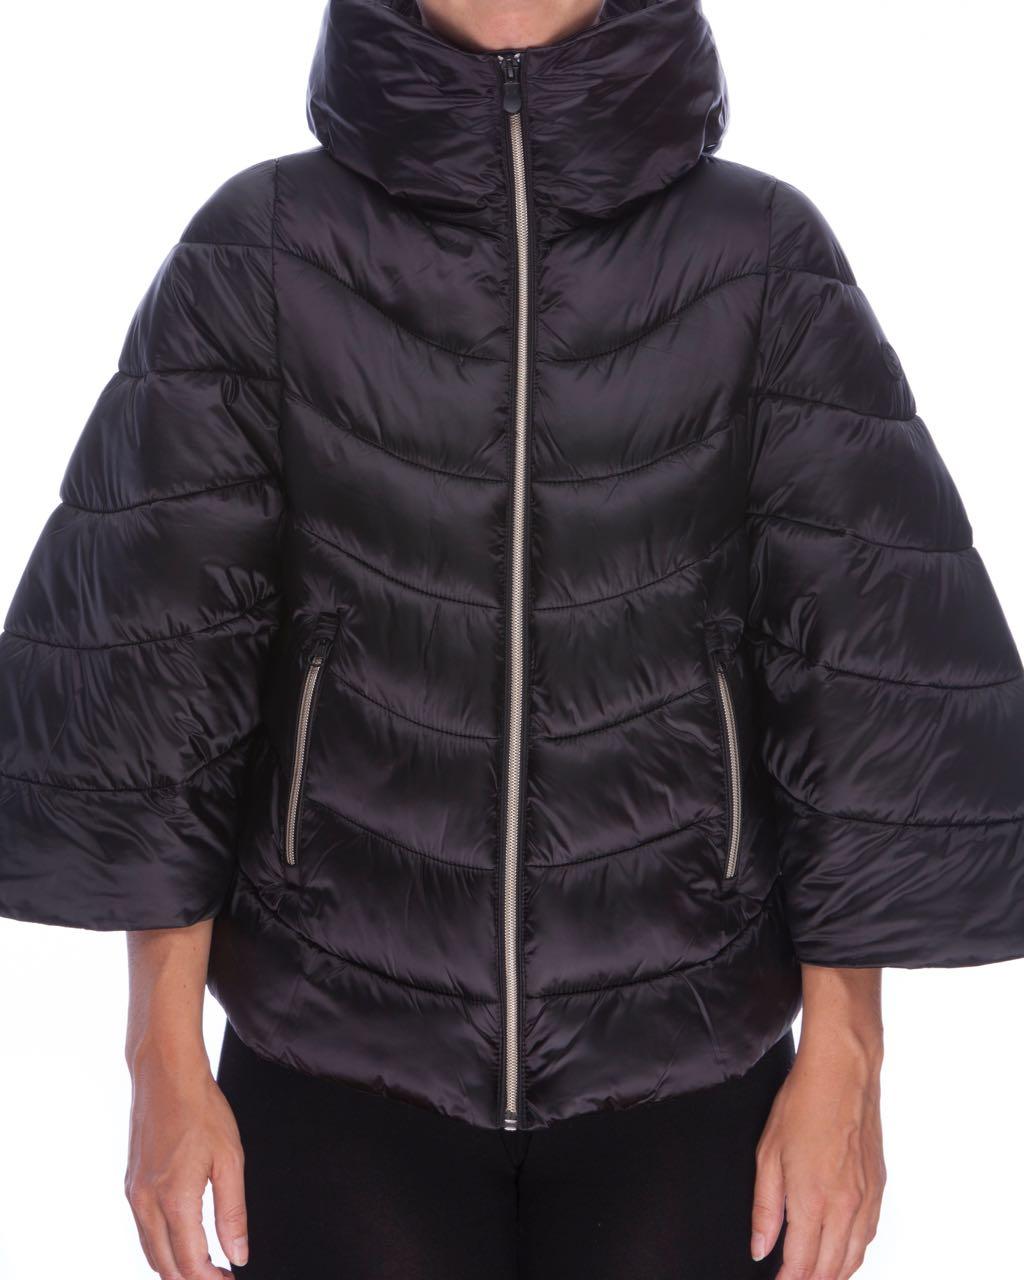 3e4672fc01f481 SAVE THE DUCK Women's Hooded Jacket S3594W-IRIS5 (Black)   Buy ...